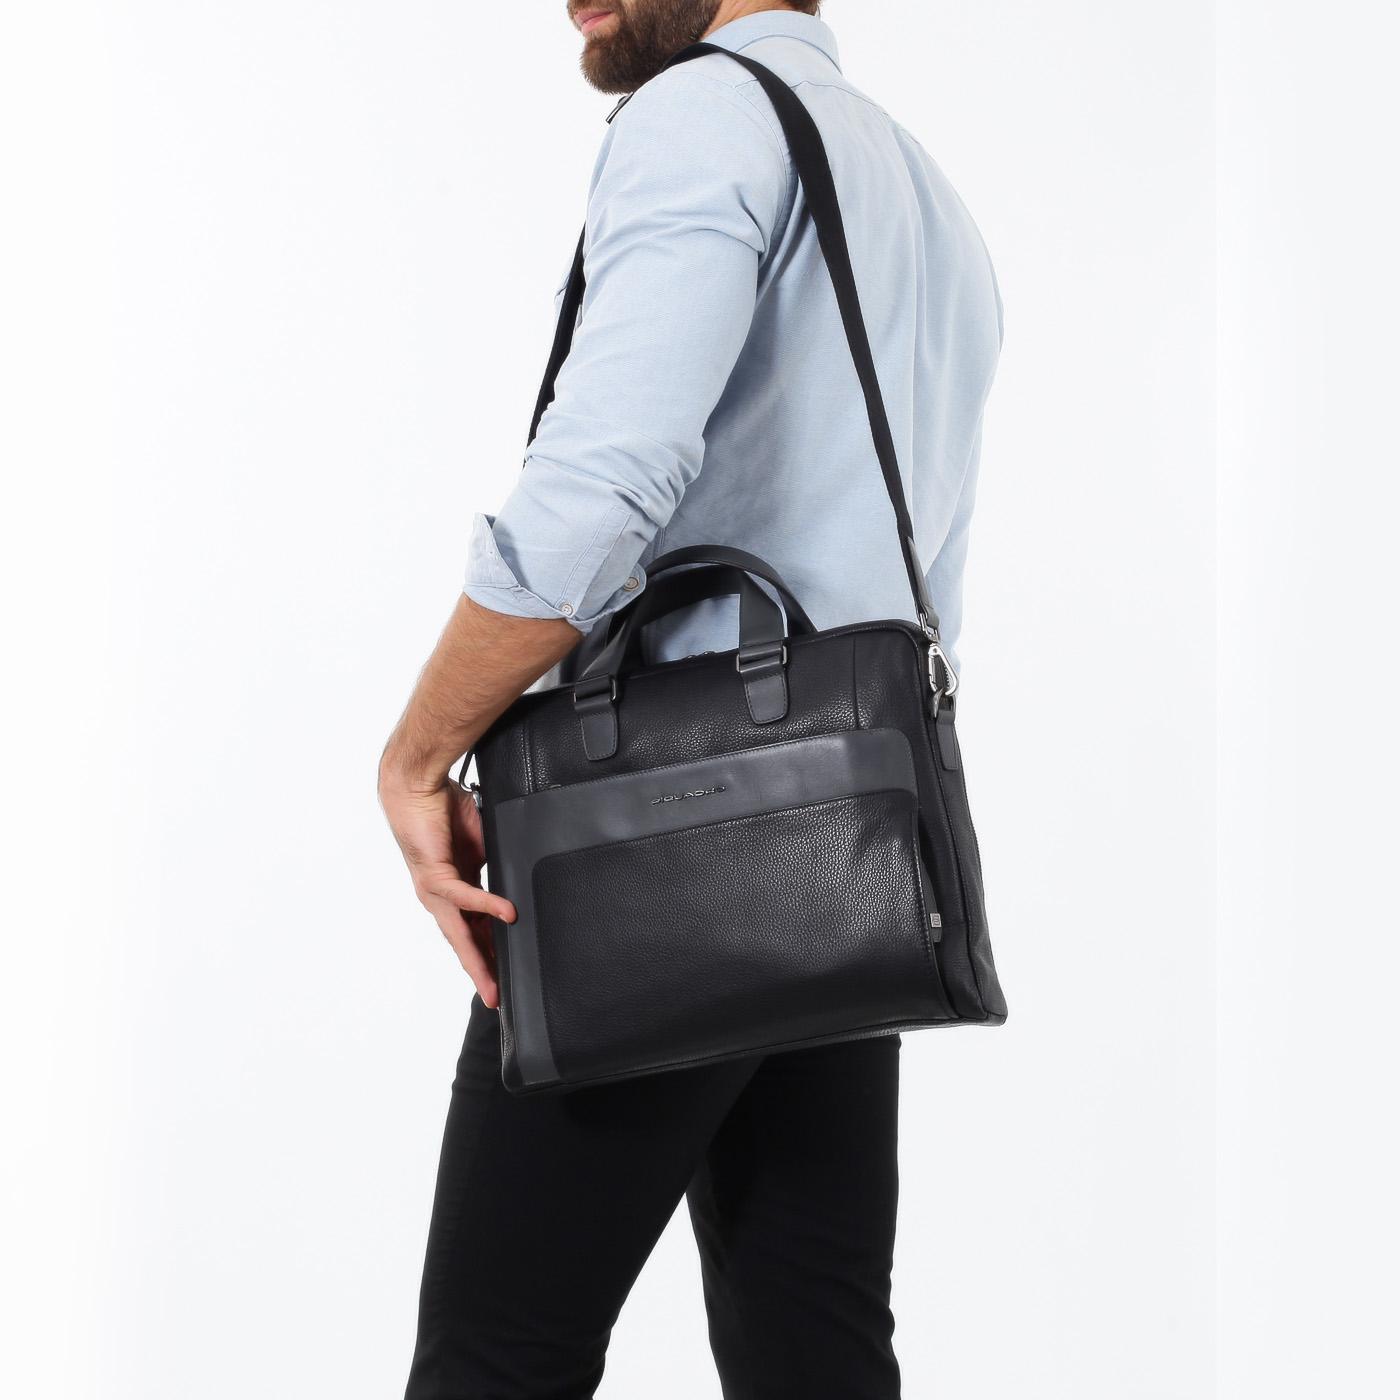 477c908d8c36 Деловая сумка на двойной молнии Piquadro Feels CA4098S97/N ...